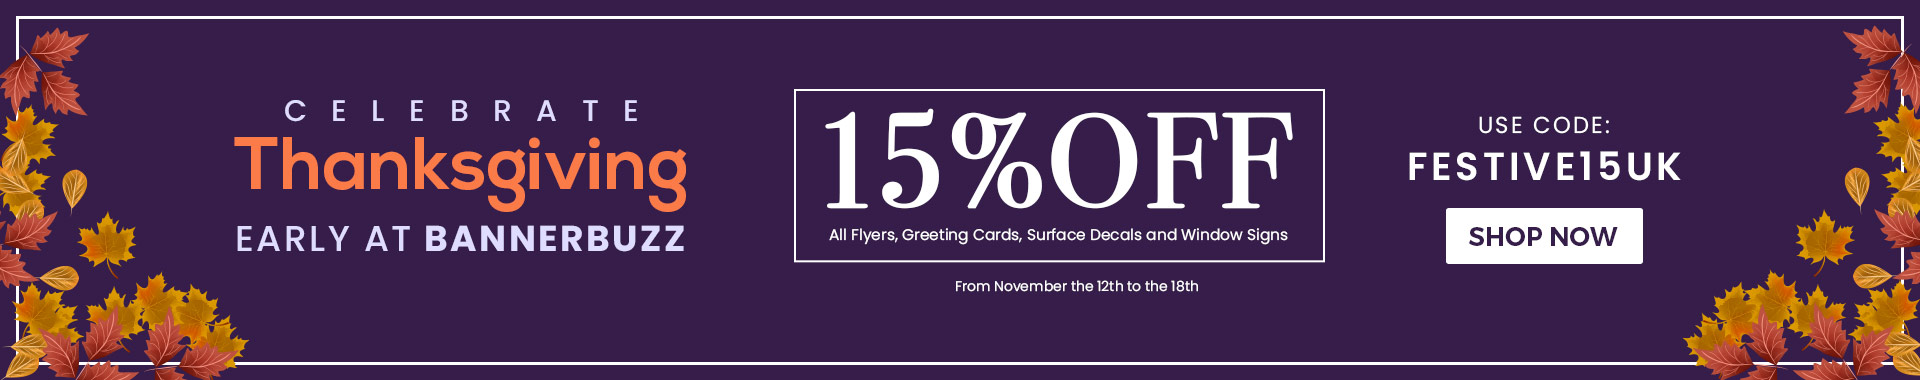 BannerBuzz's Pre-Thanksgiving 15% Off Sale!